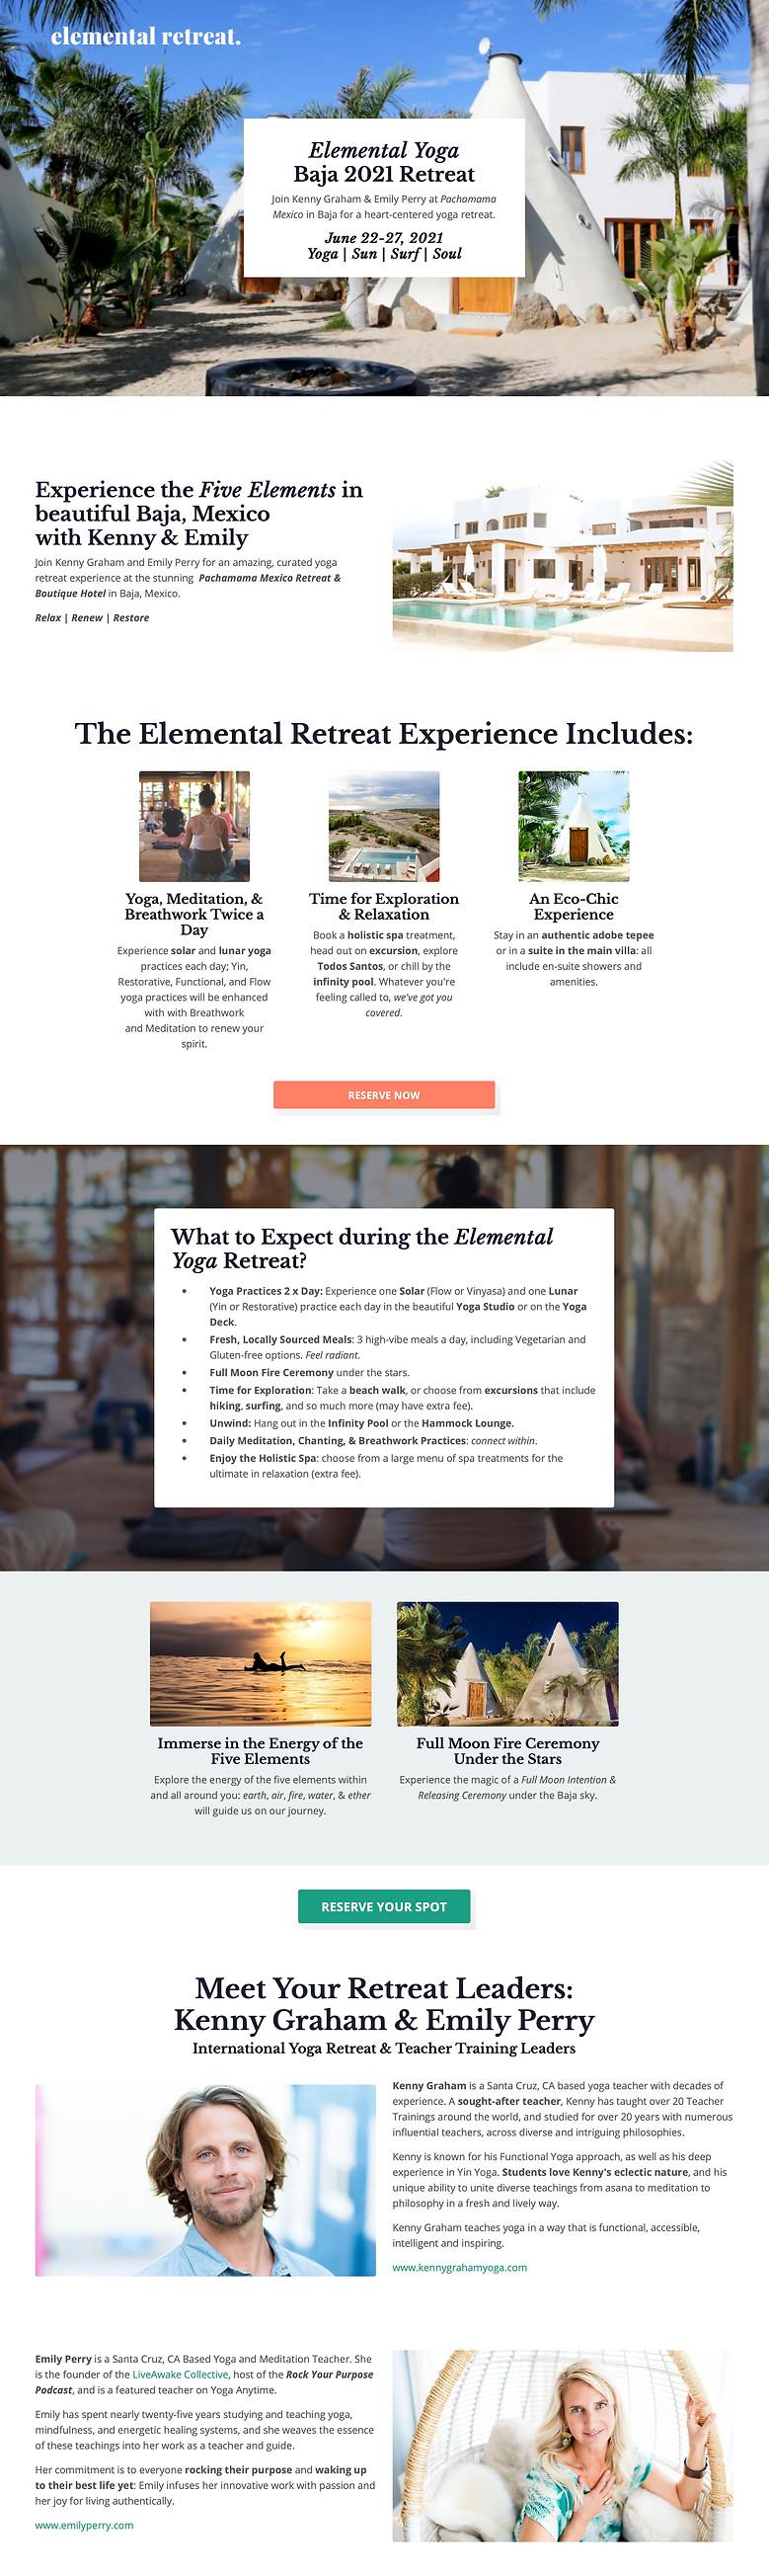 Elemental Yoga Retreat  Baja 2021 with K